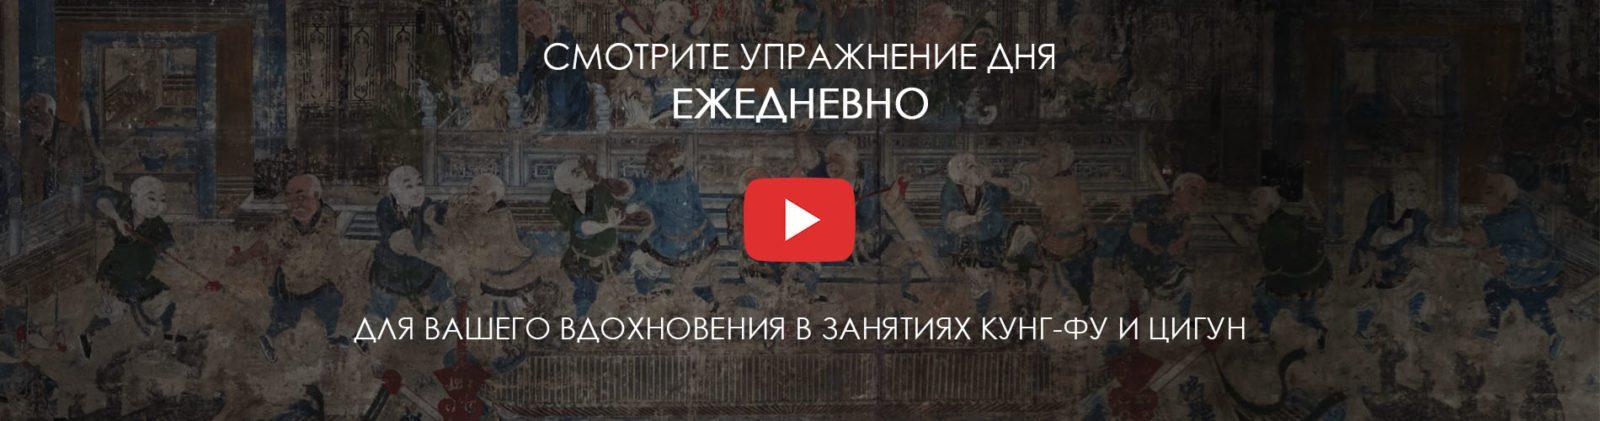 videodnya_slider